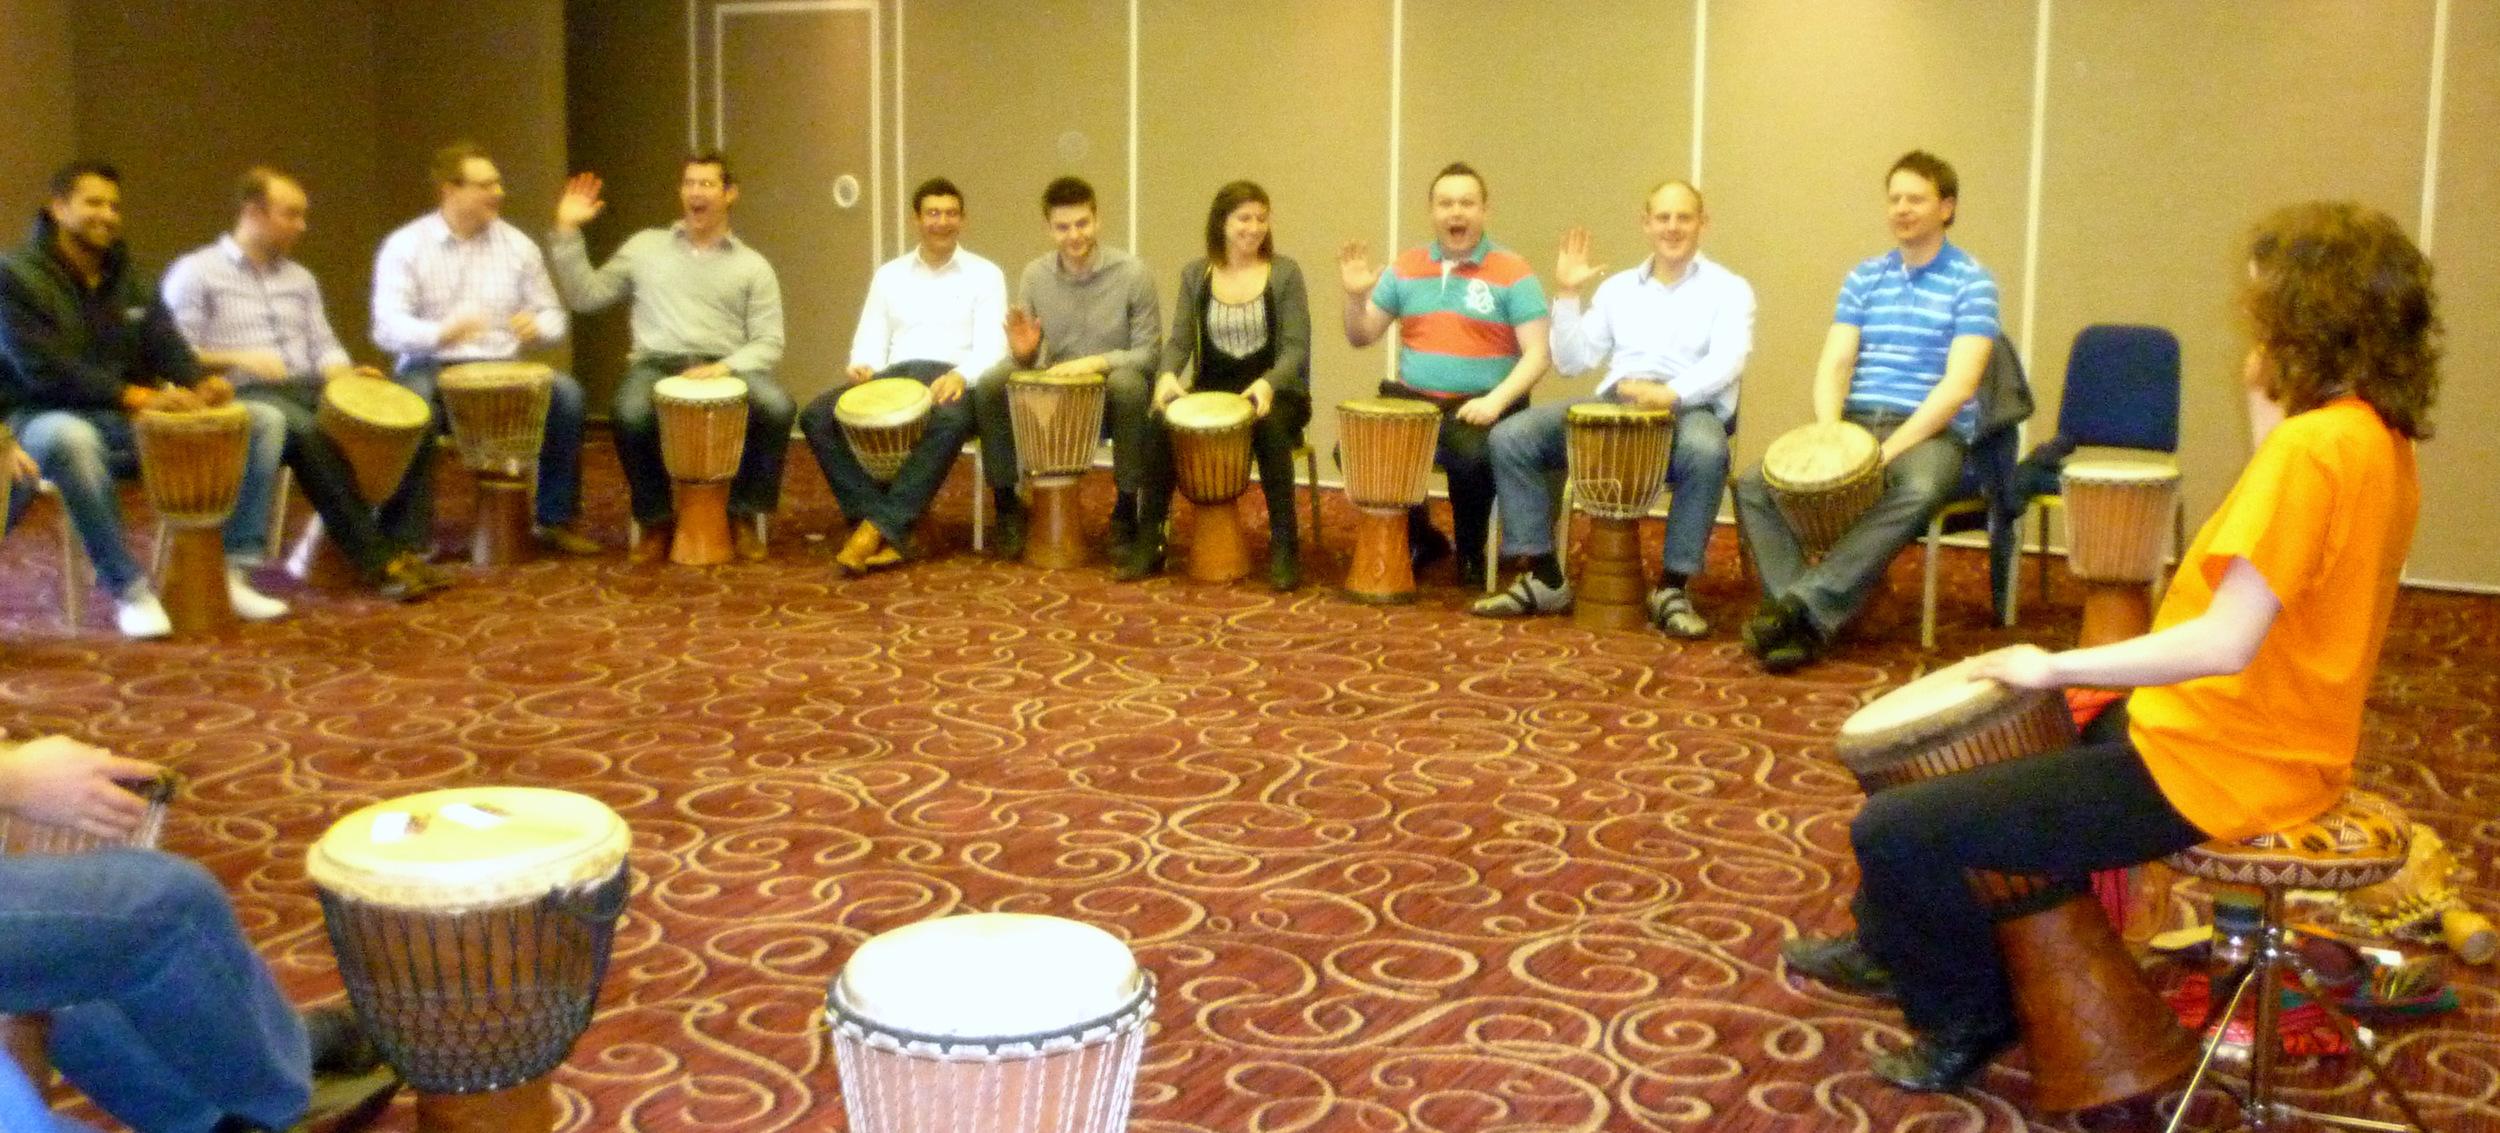 Corporate drumming events in Buckinghamshire